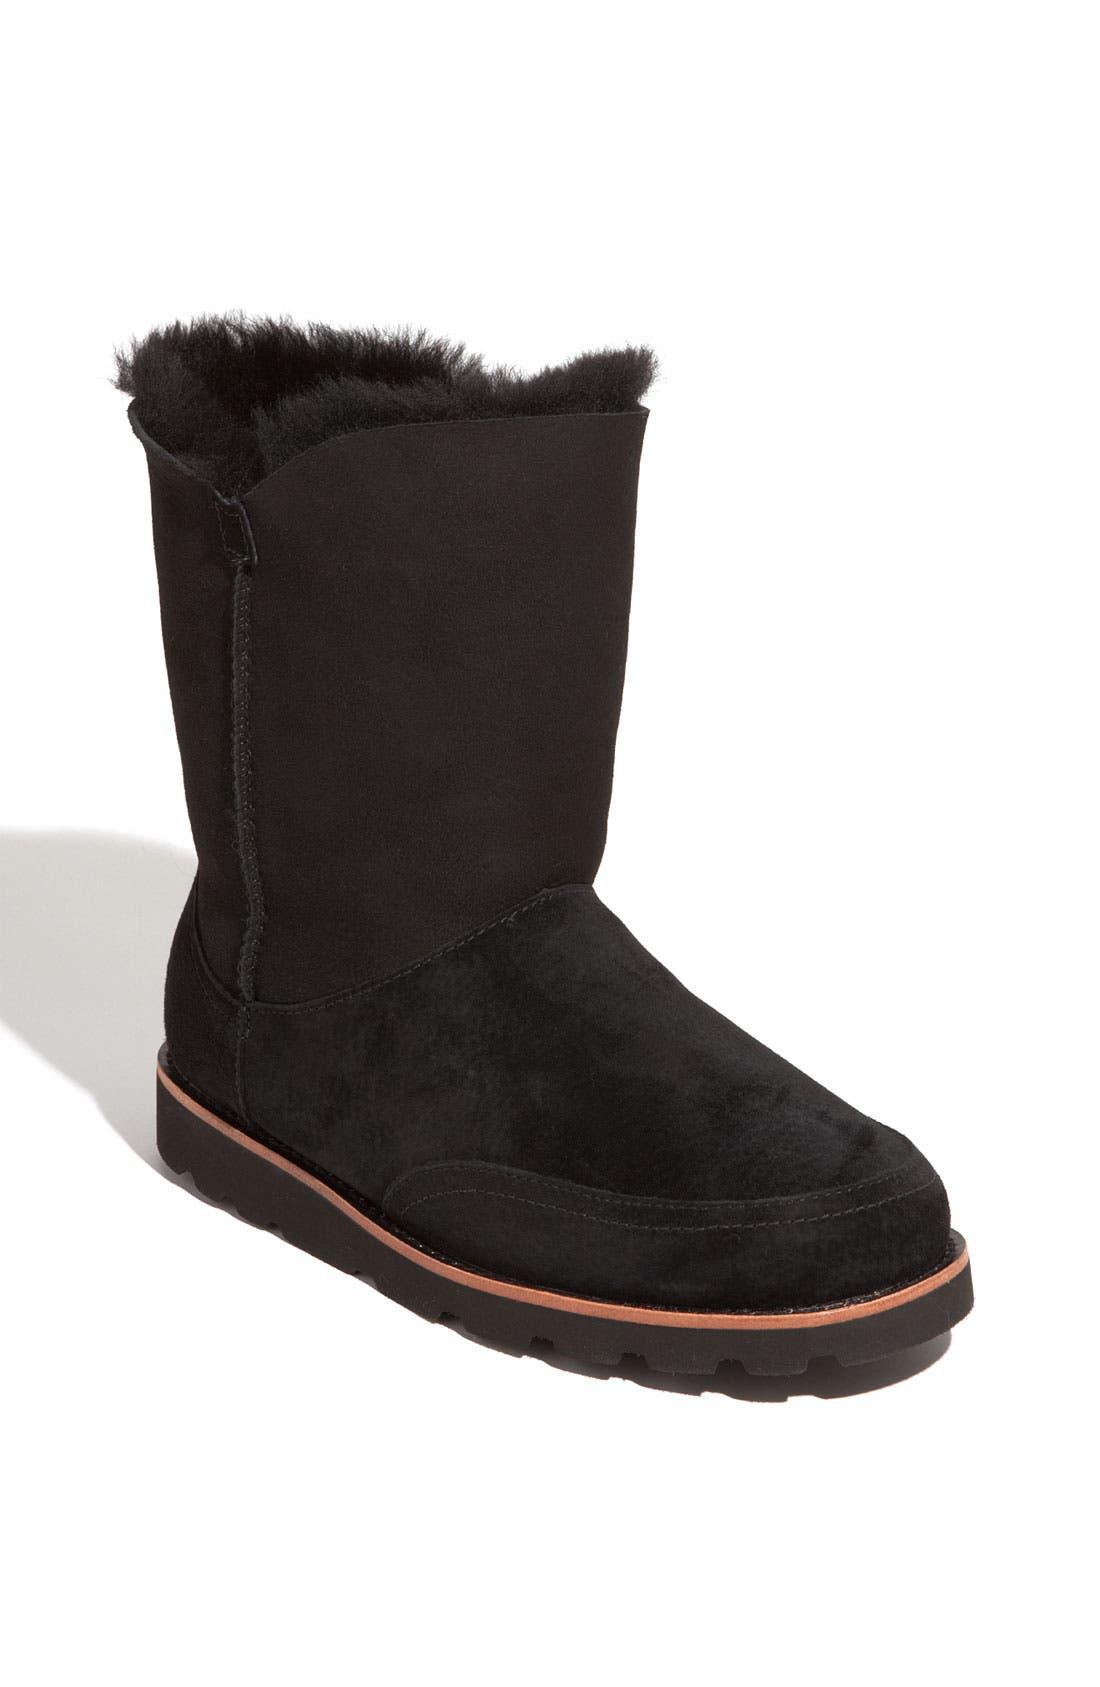 Australia 'Shanleigh' Boot,                         Main,                         color, 001